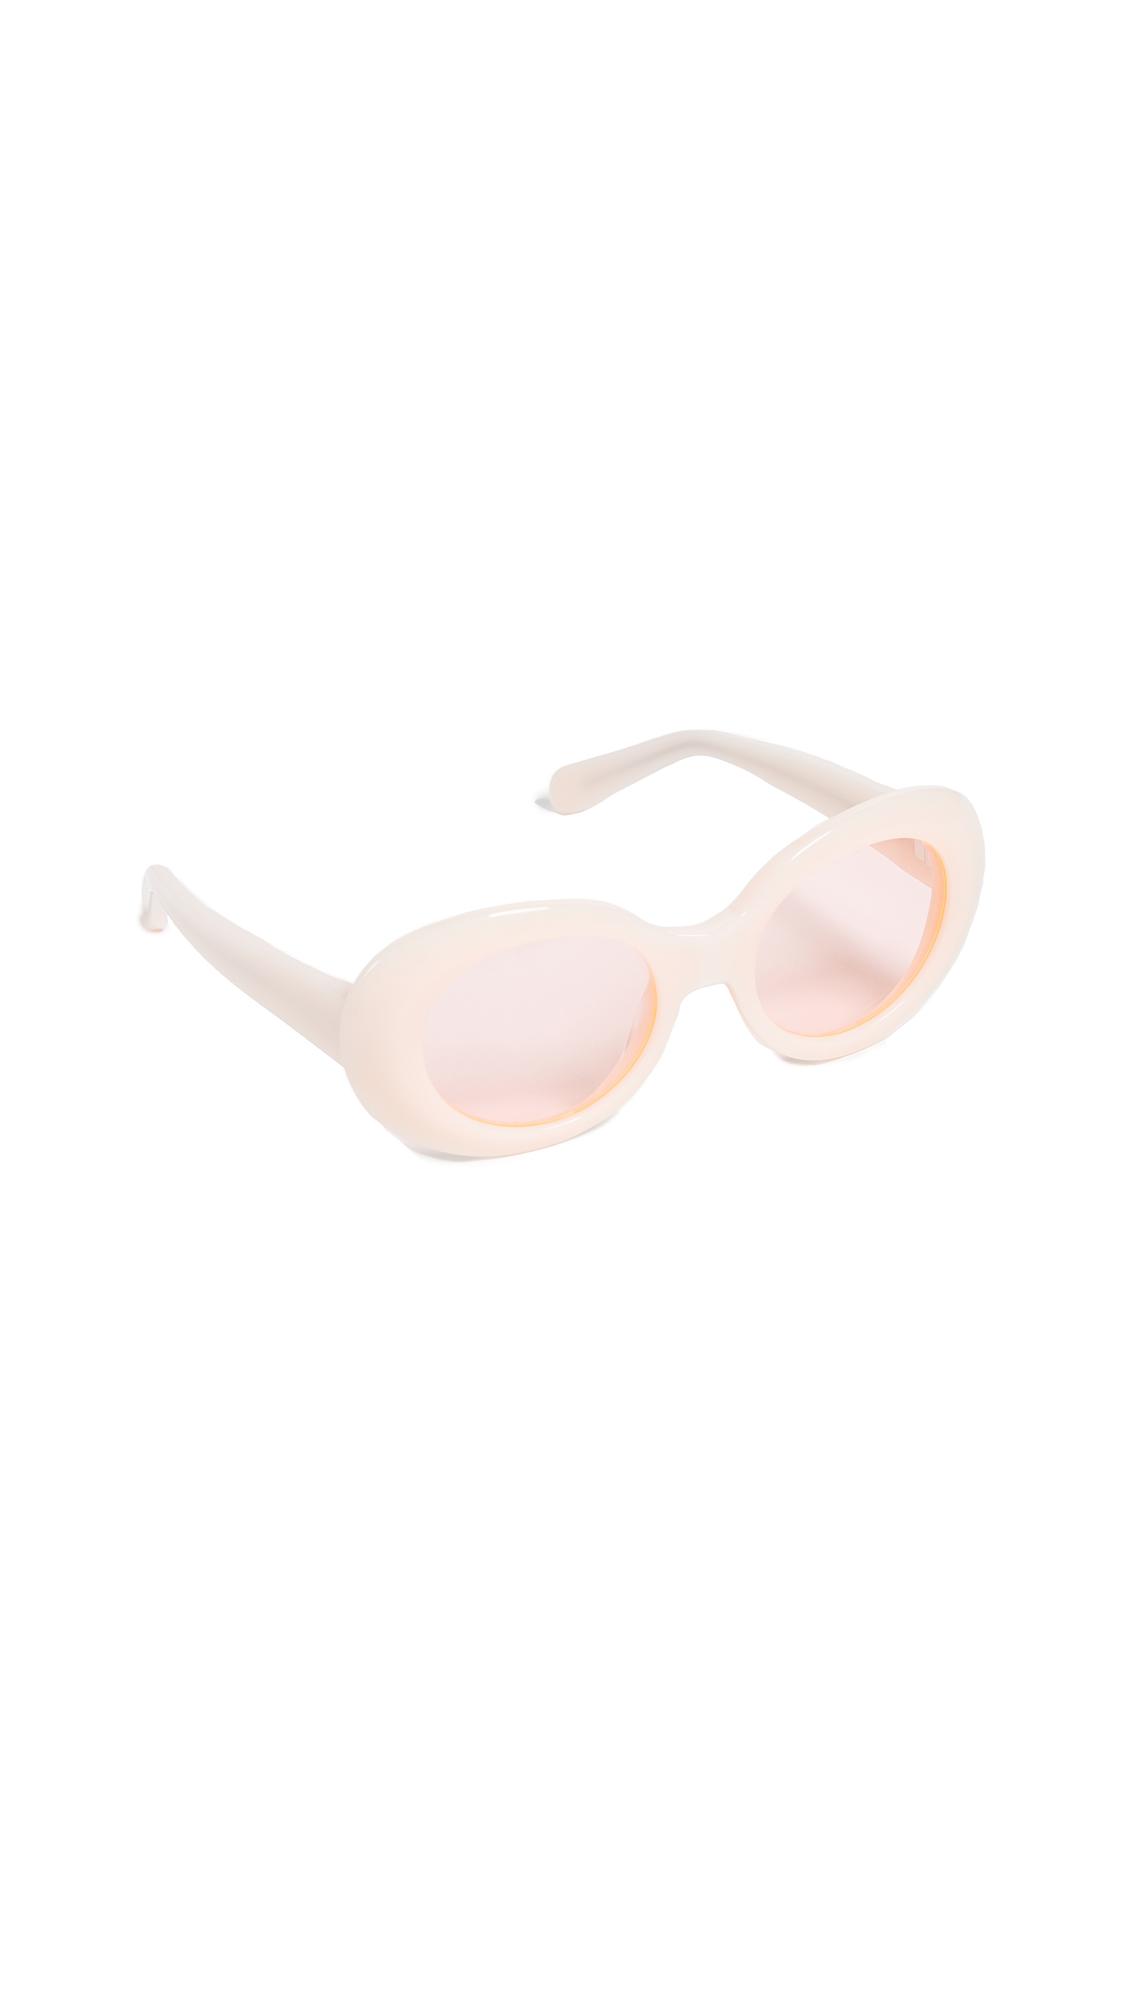 Acne Studios Mustang Sunglasses - Pink/Fluo Pink